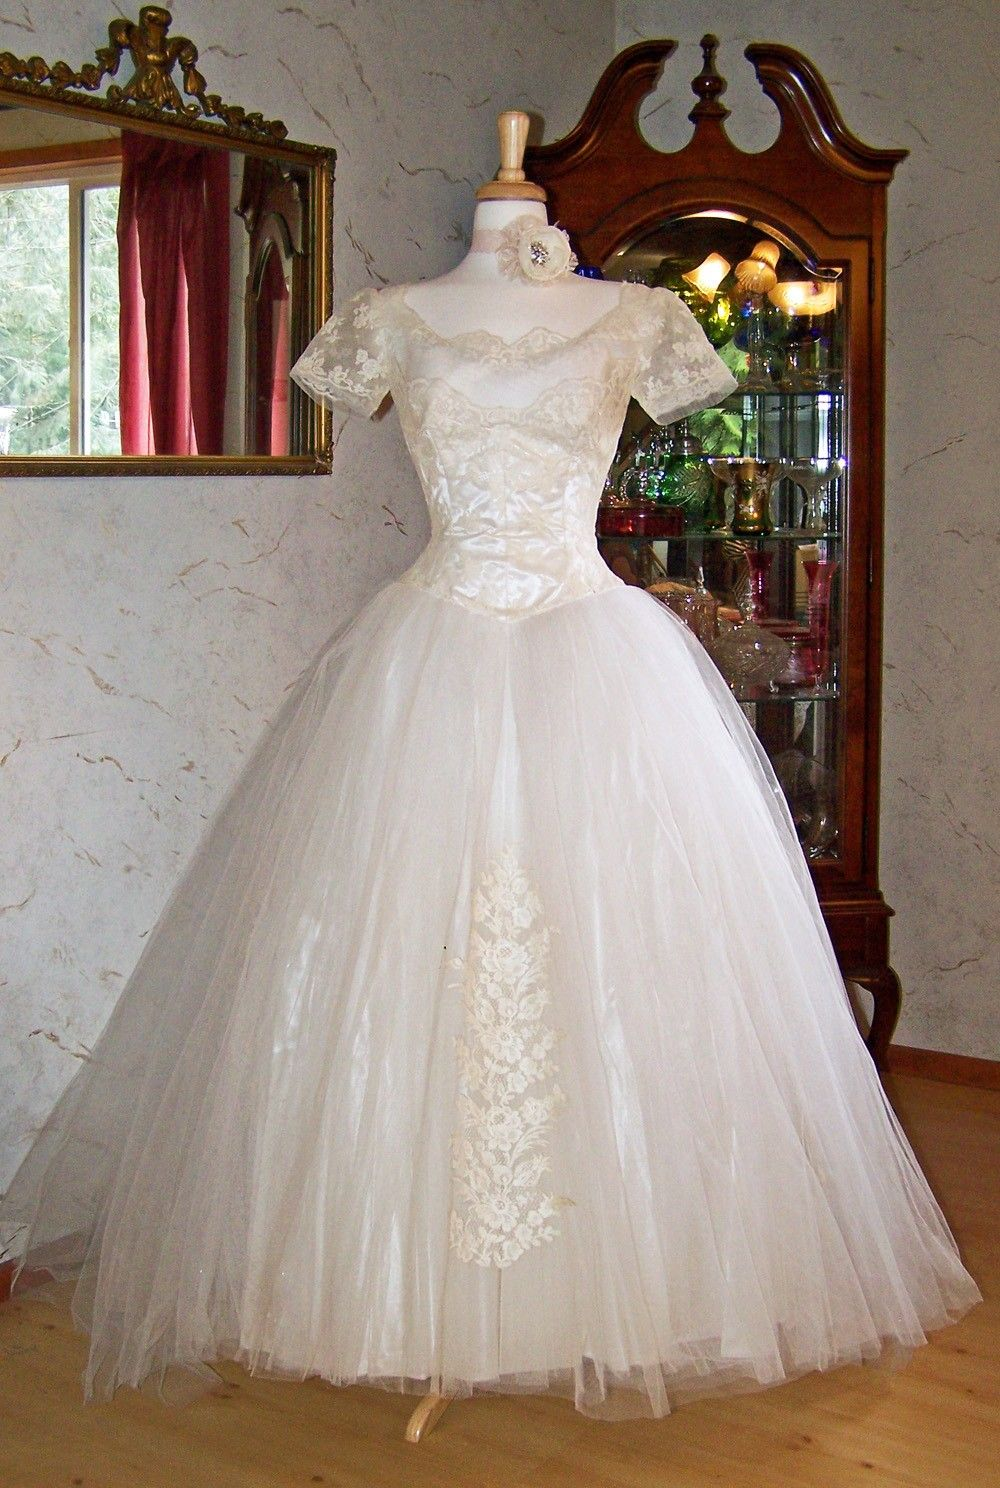 Vintage Wedding Dresses Nyc Vintage Wedding Dress 1950 Wedding Dresses Nyc Lace Wedding Dress Vintage